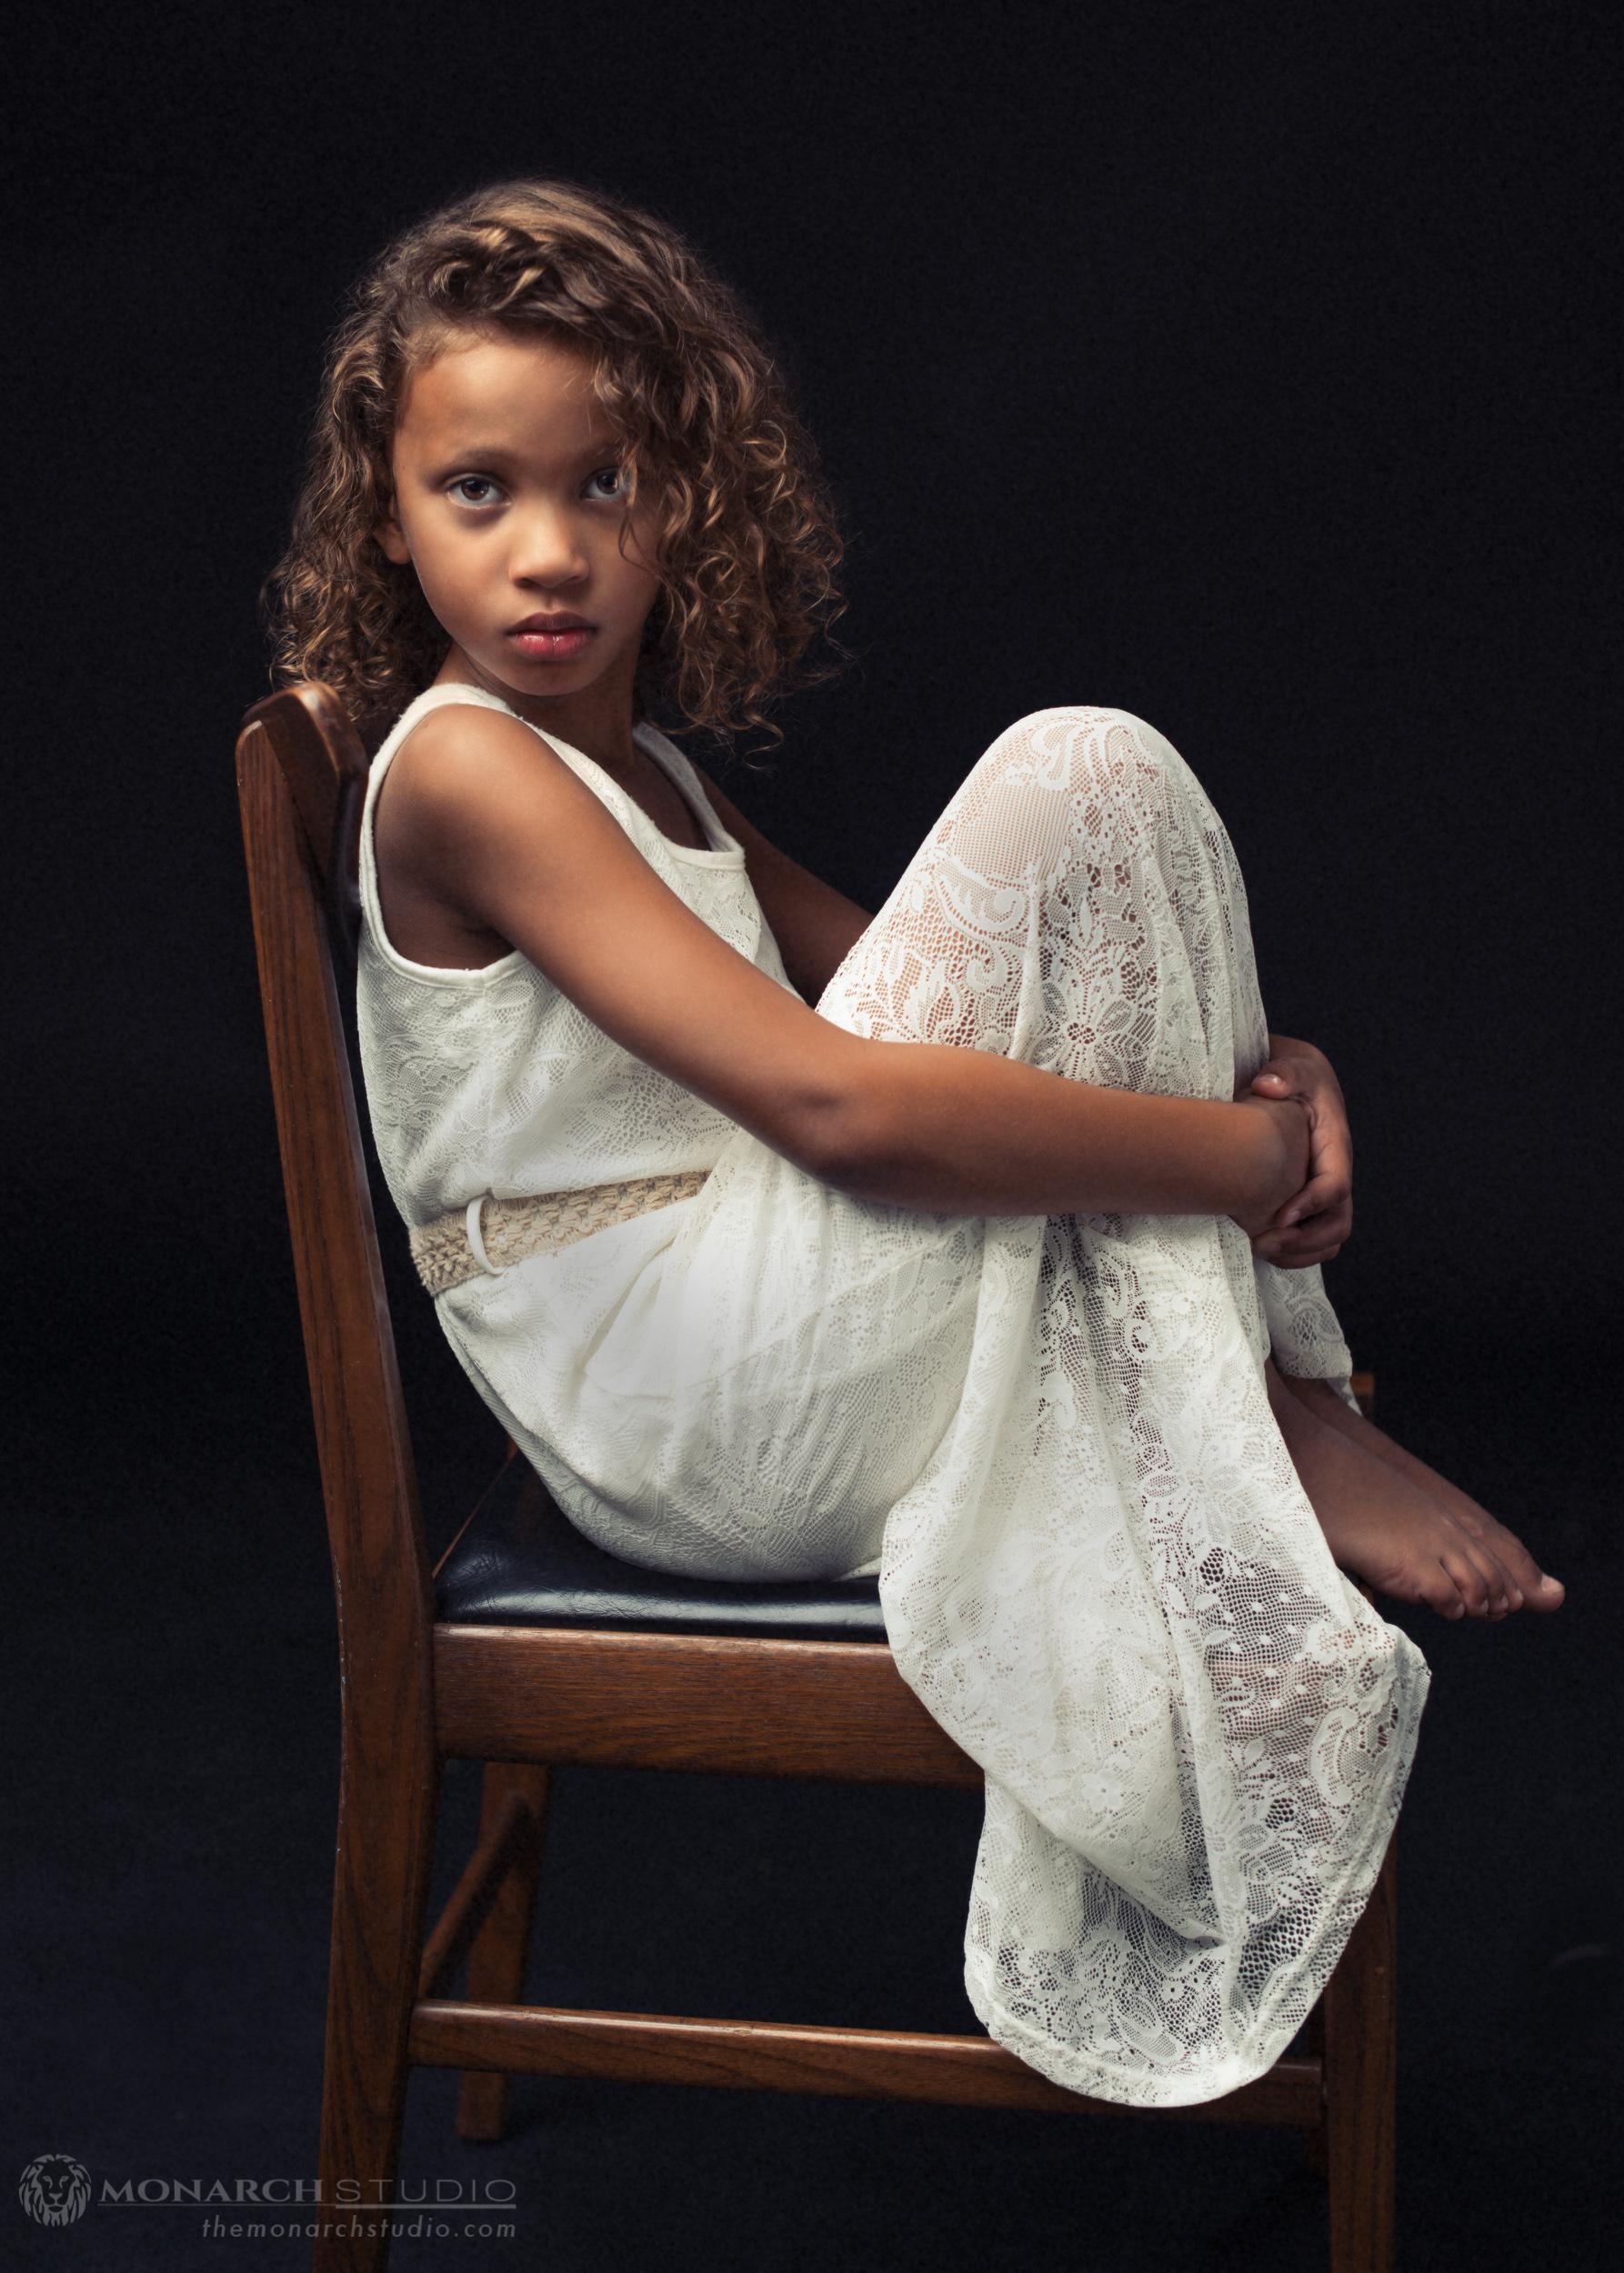 Fine-Art-Childrens-Photographer-7.jpg